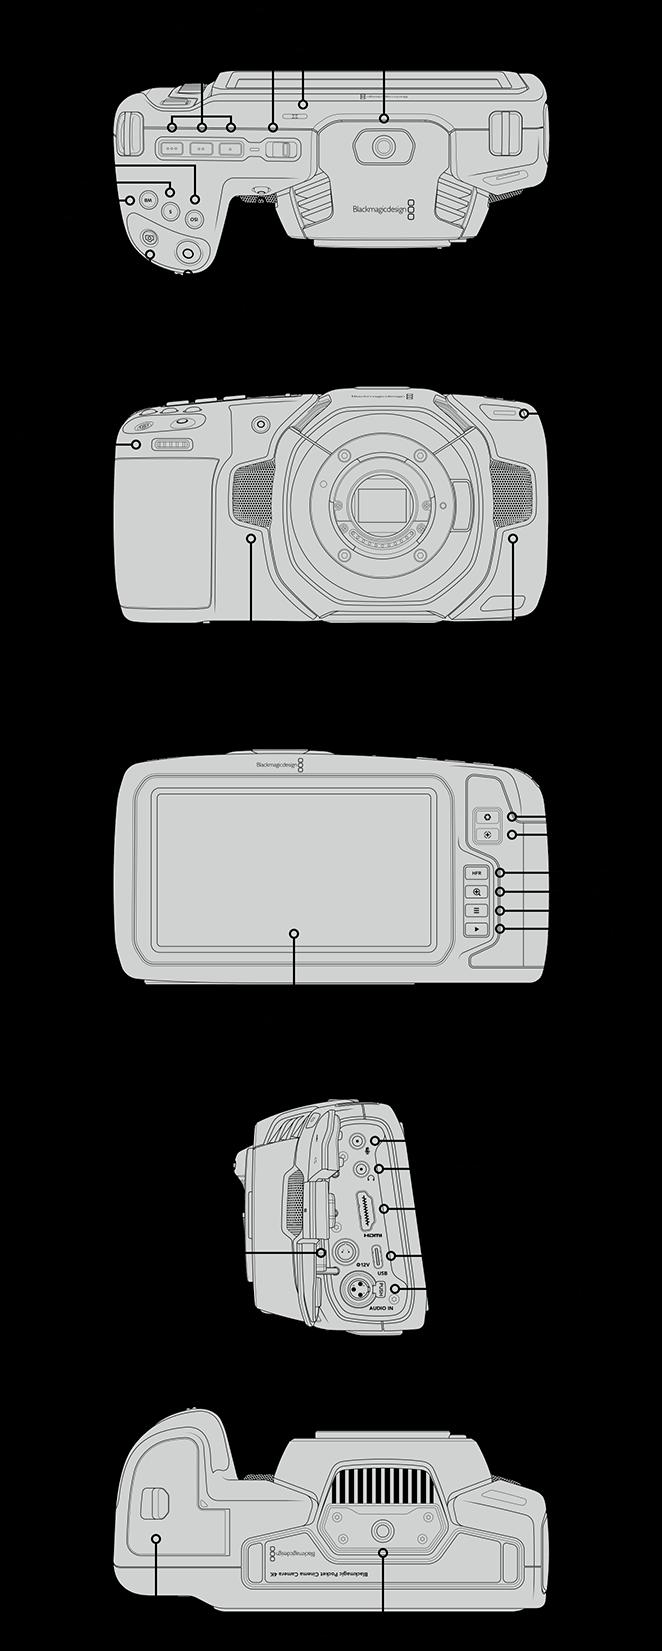 Blackmagic Pocket Cinema Camera 4K Connections